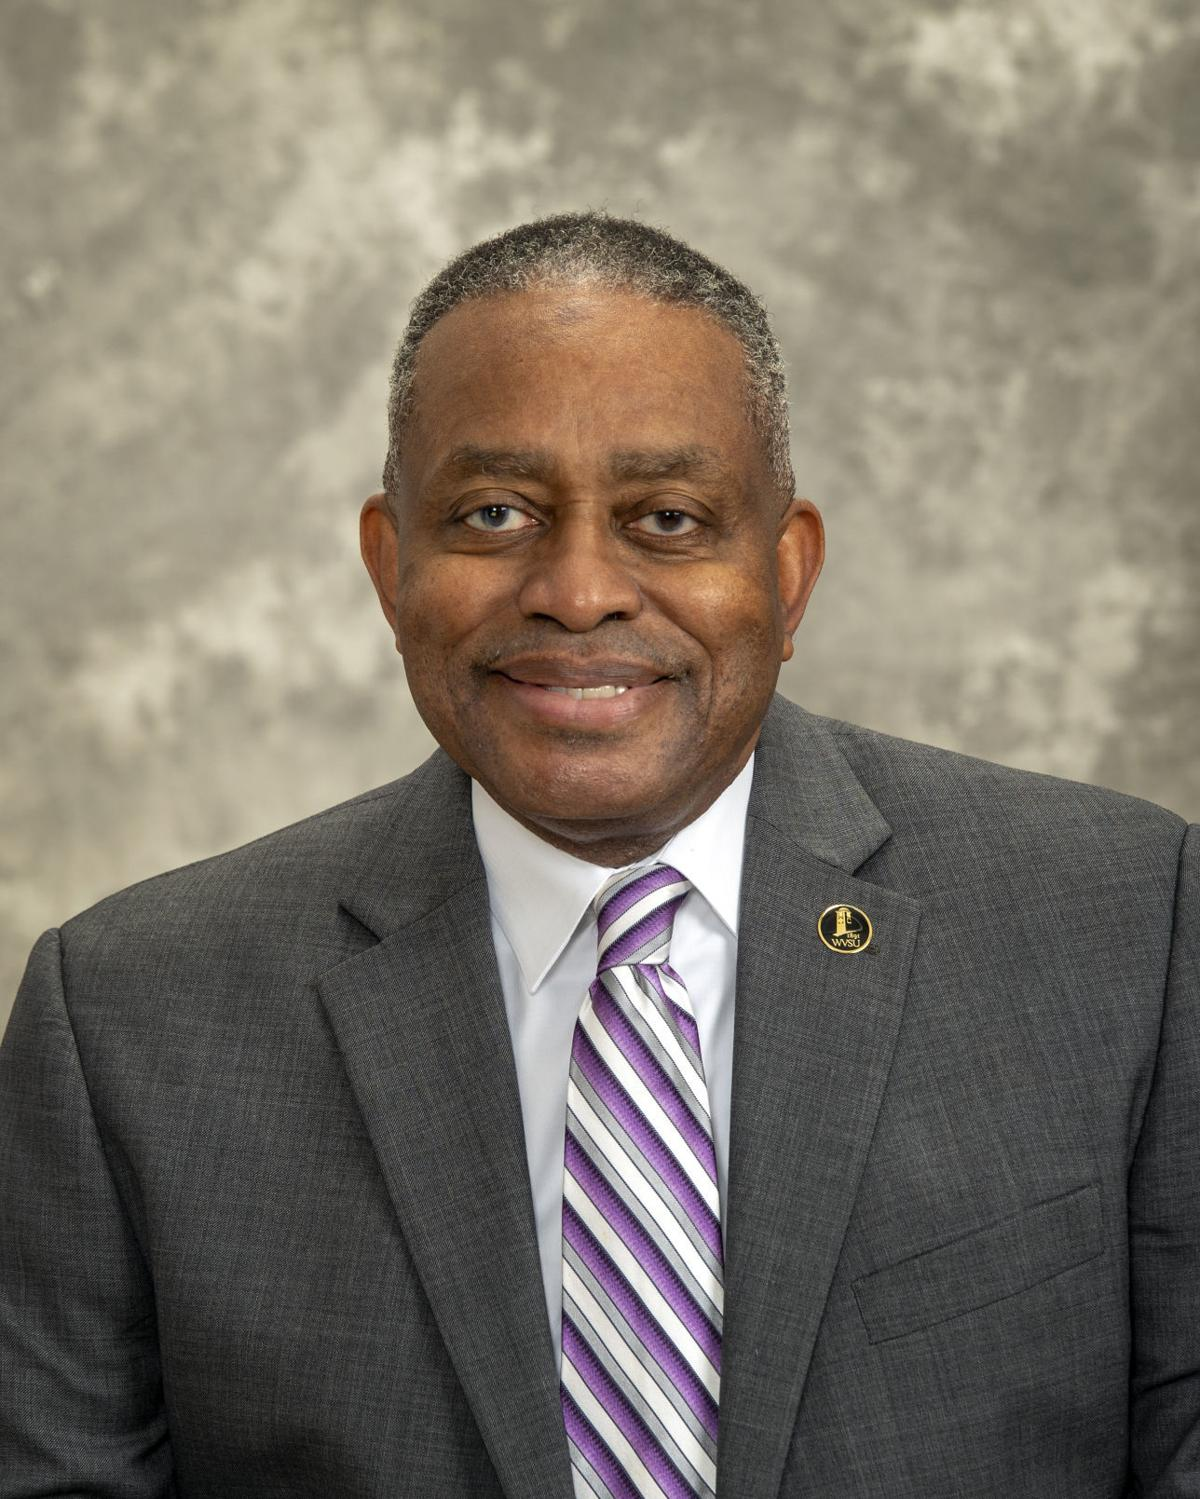 R. Charles Byers, WV State University